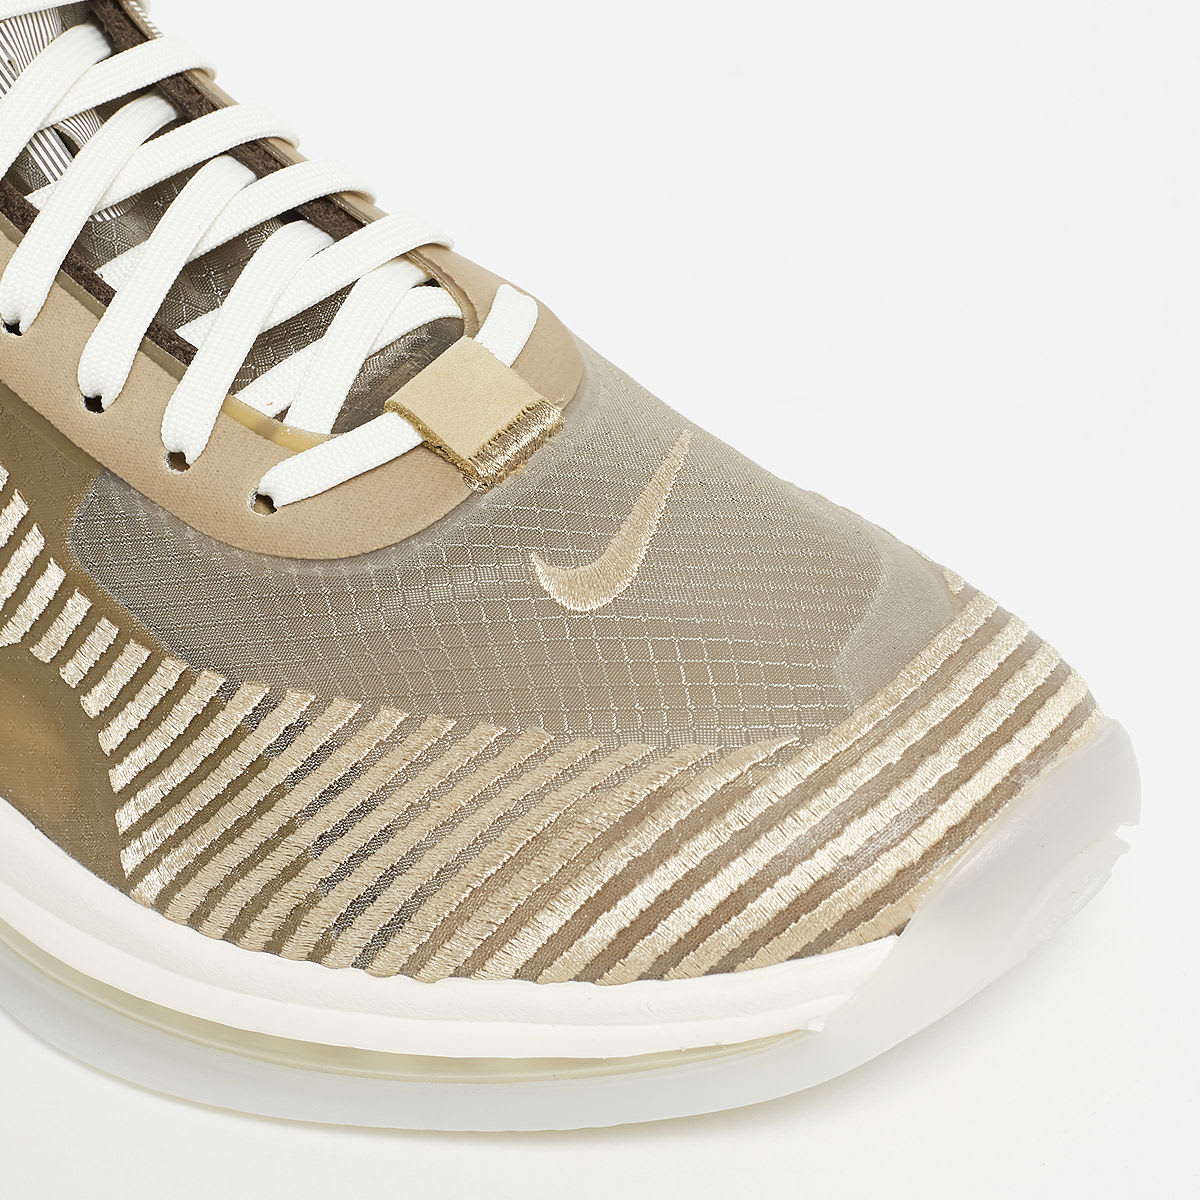 John Elliott x Nike LeBron Icon QS 'Parachute Beige' AQ0114-200 (Toe)